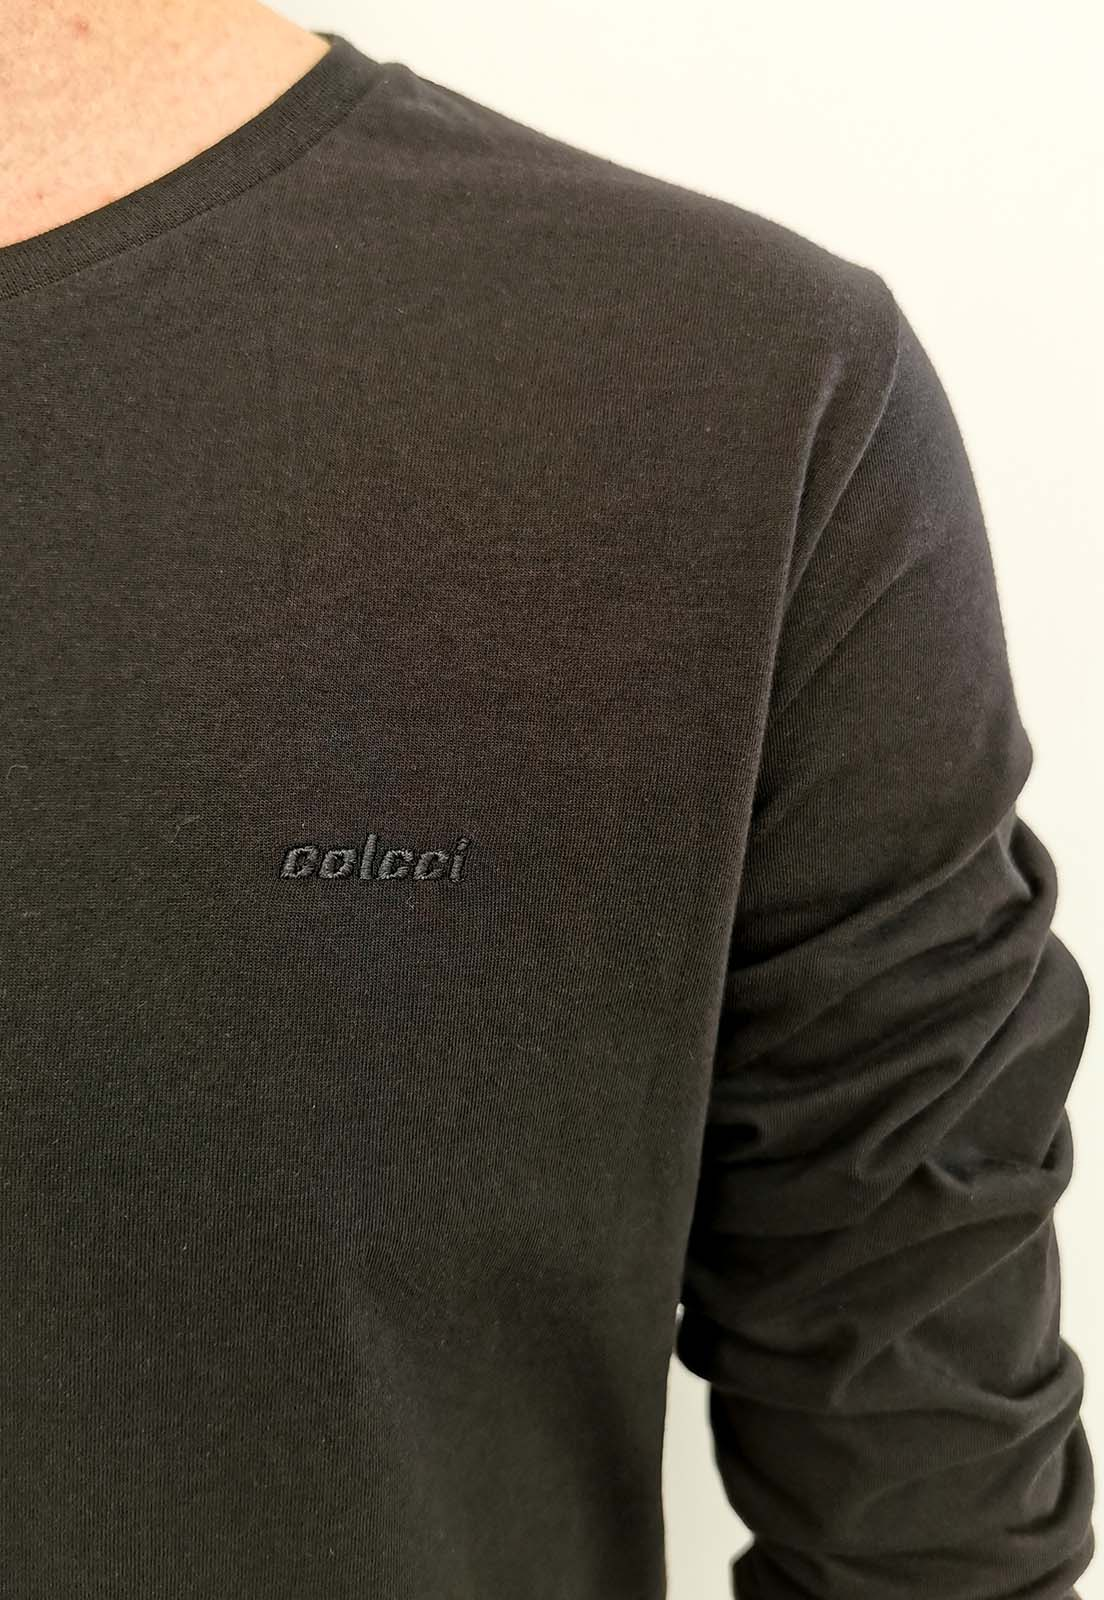 Camiseta Colcci Manga Longa Preto Básica